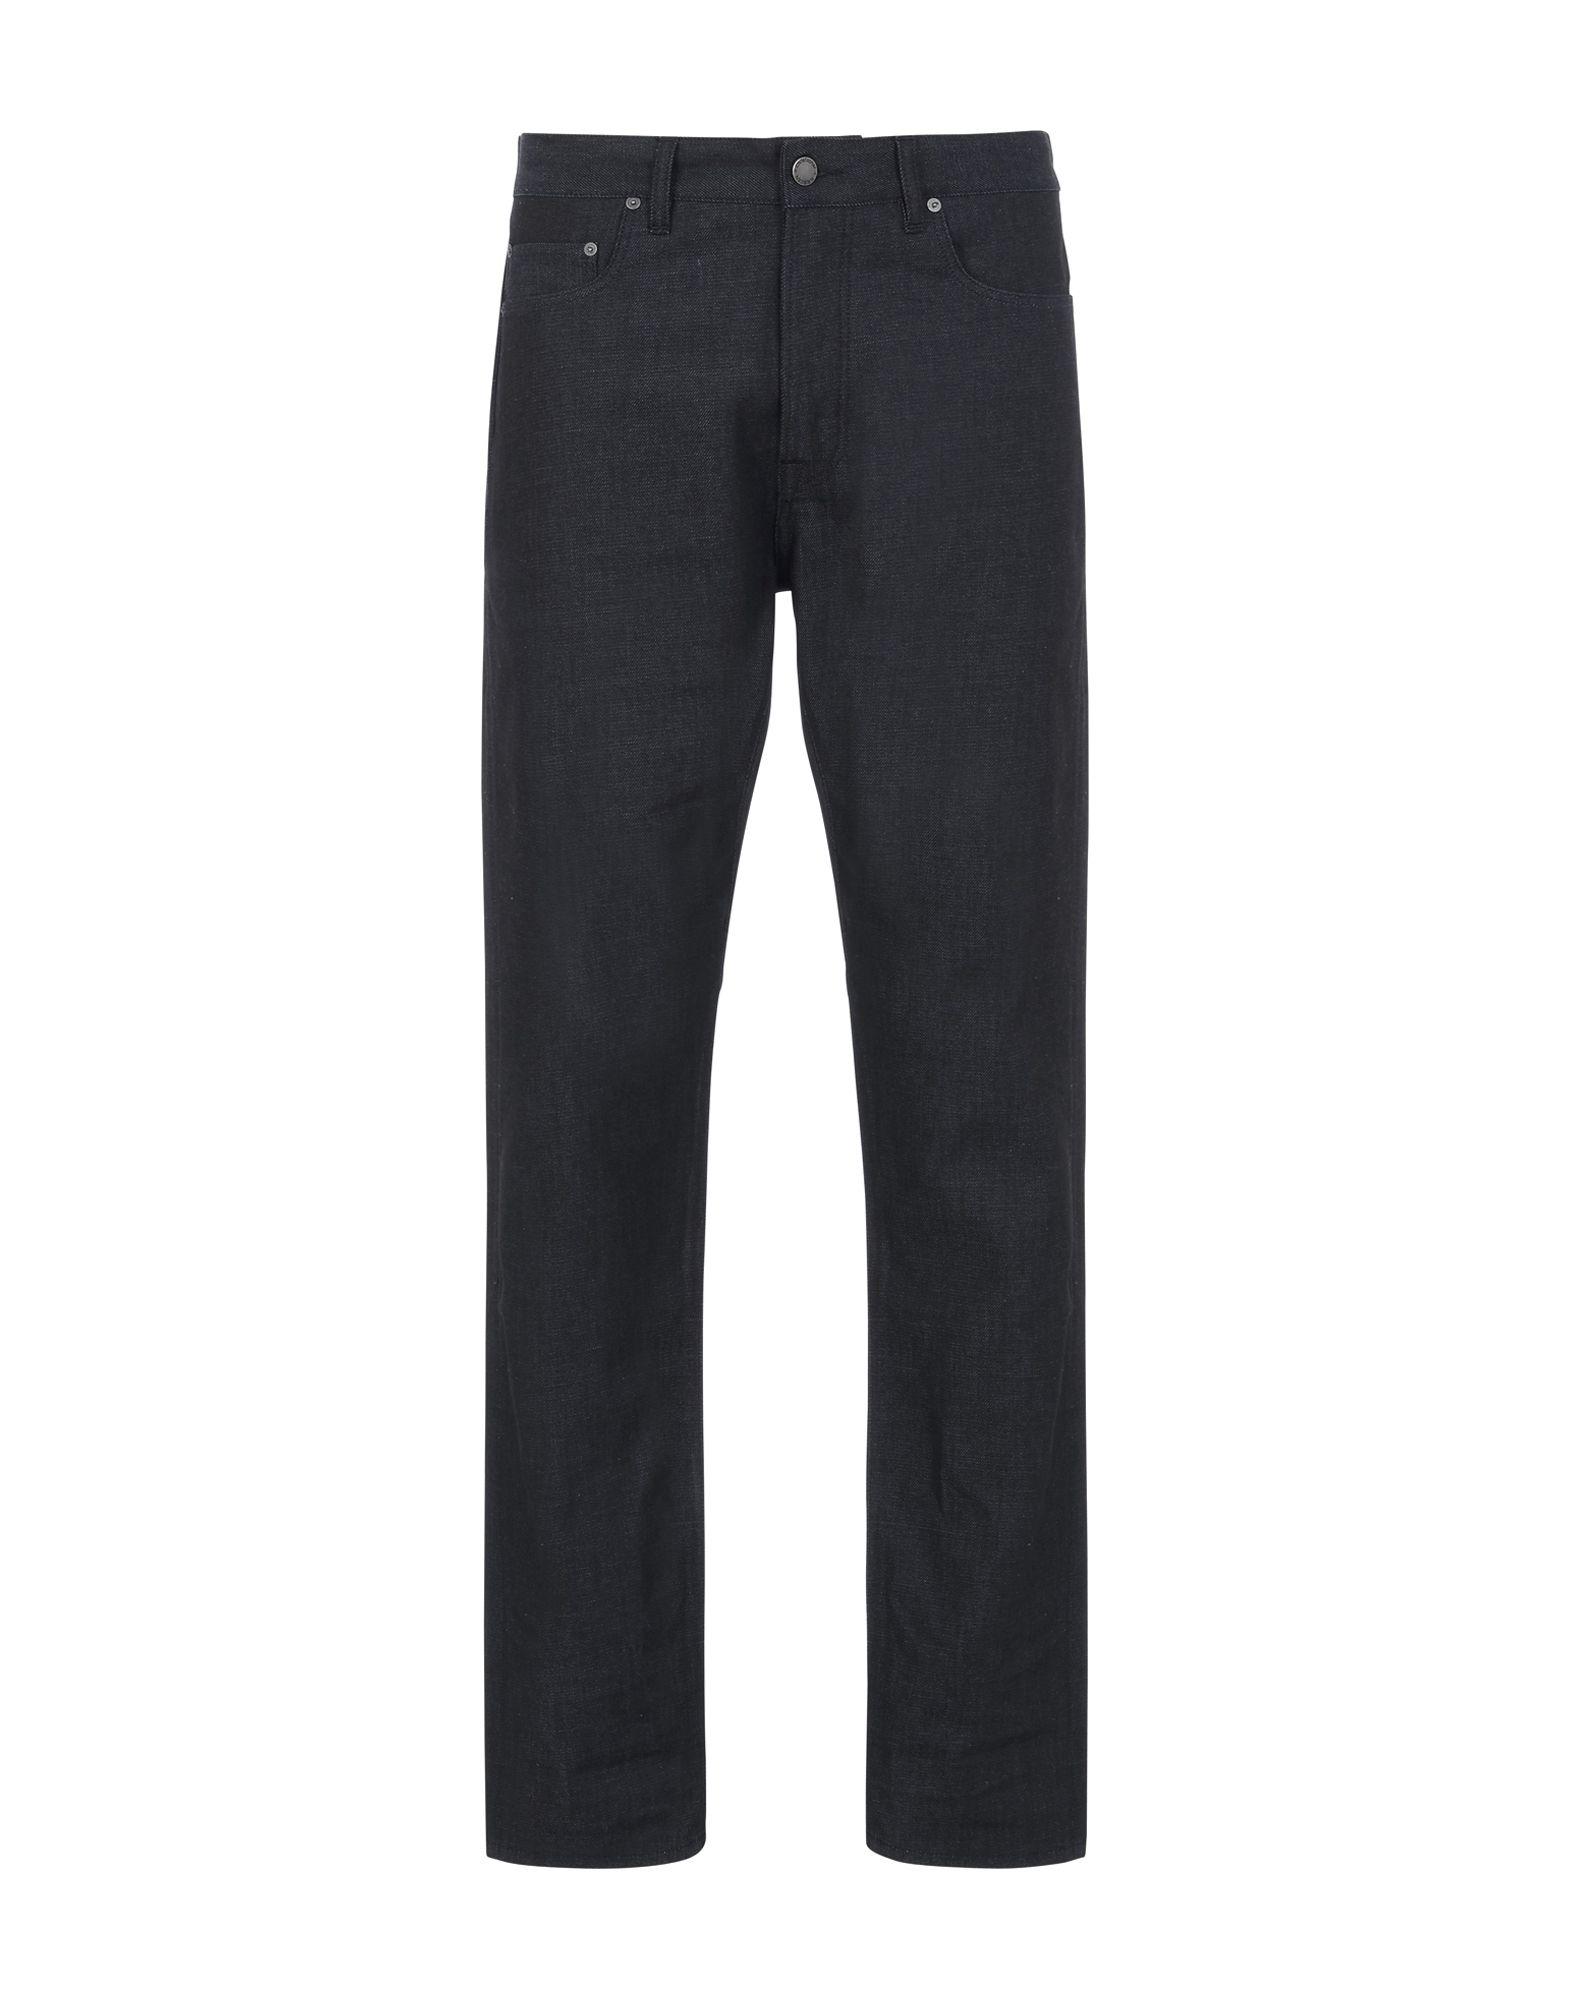 CHRISTOPHER RAEBURN Джинсовые брюки christopher raeburn спортивные брюки мужские